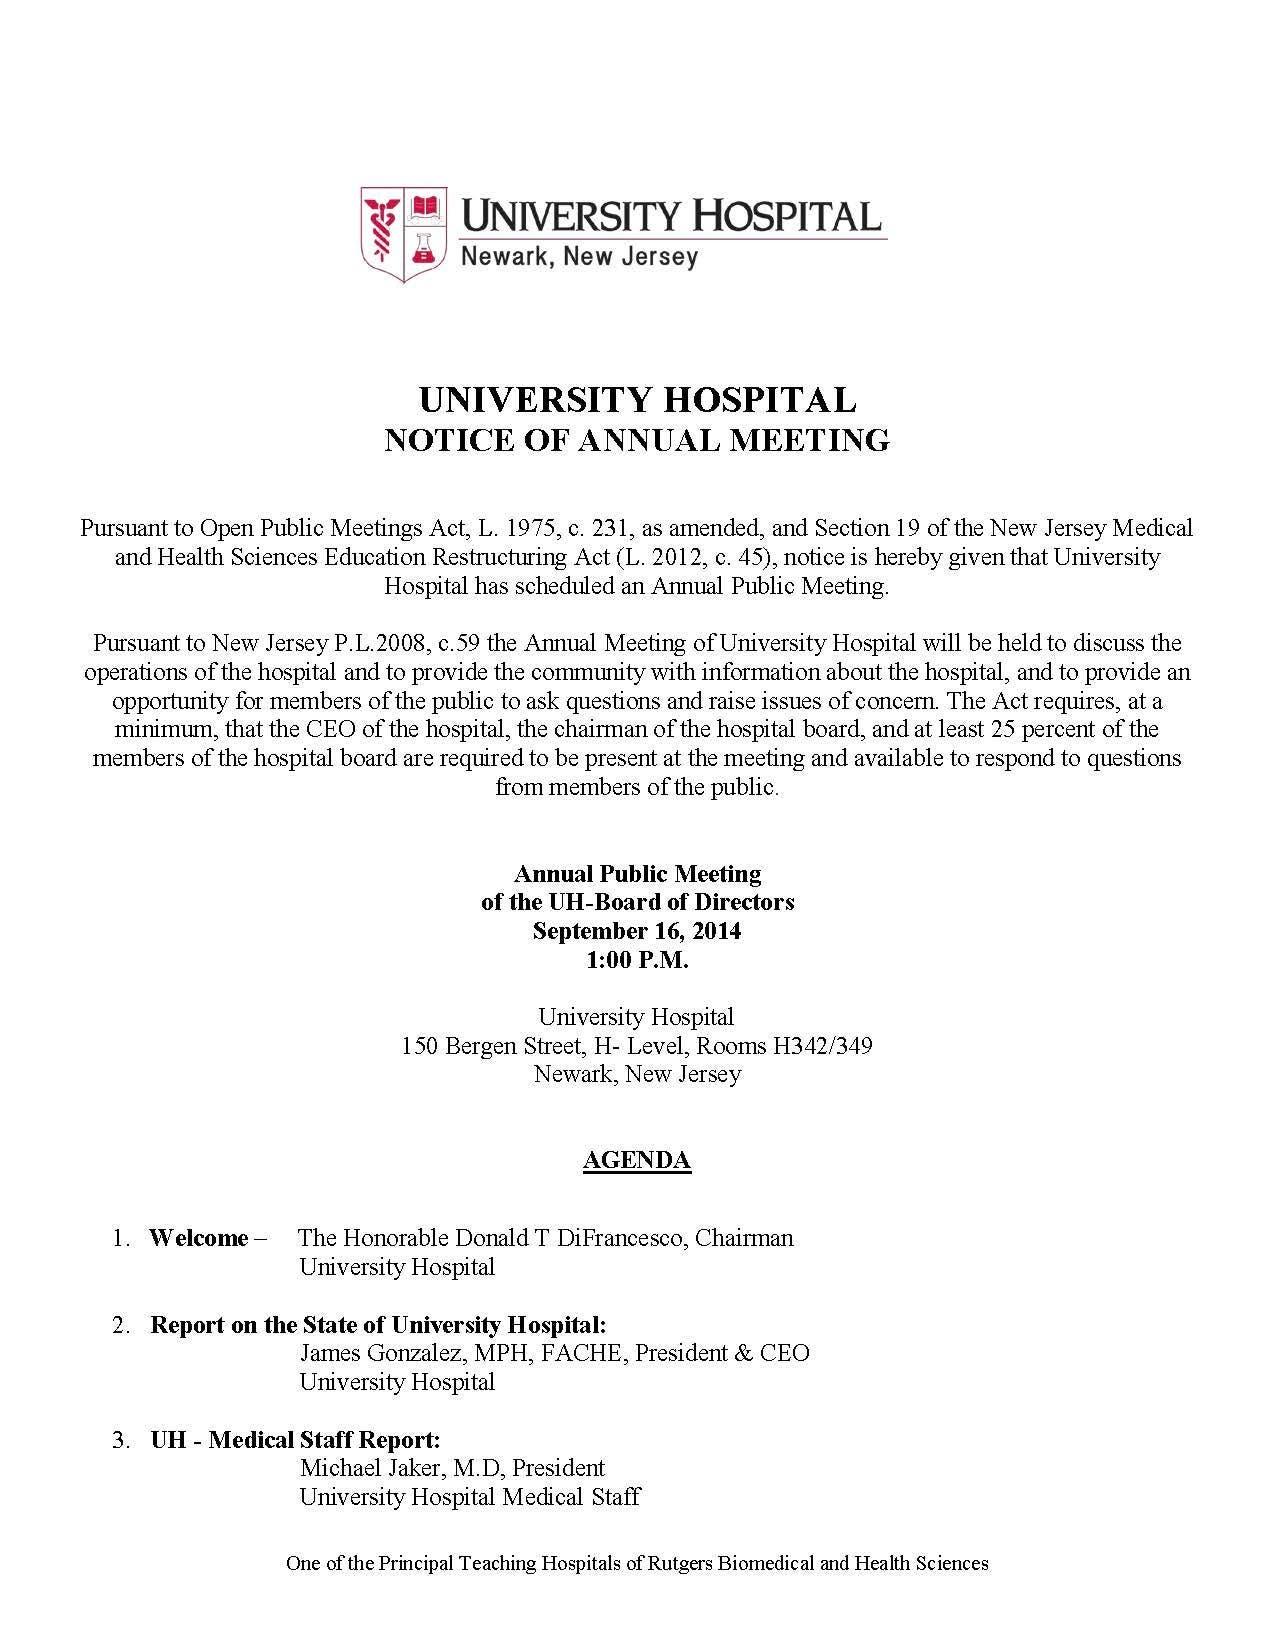 University Hospital Notice of Annual Public Meeting | Newark, NJ Patch